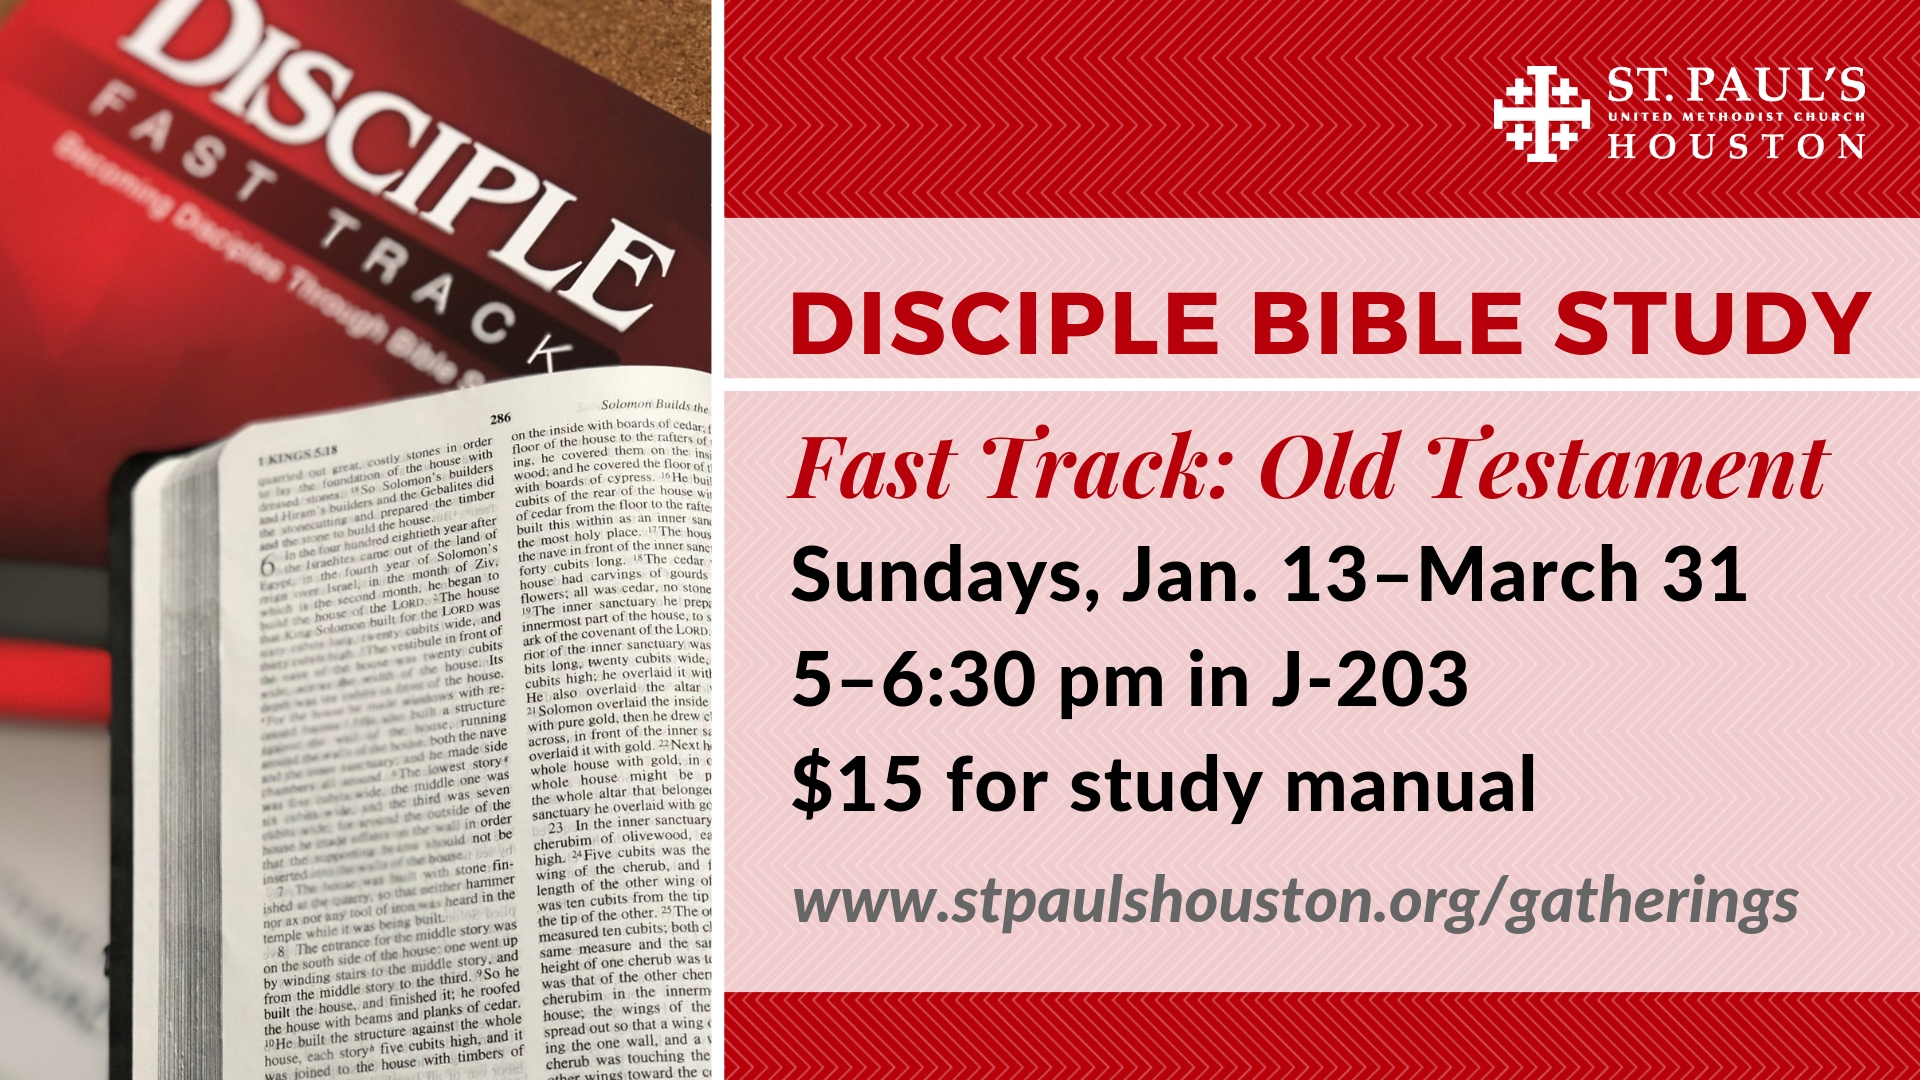 16x9 Old Testament_ Disciple Bible Study 2019.jpg